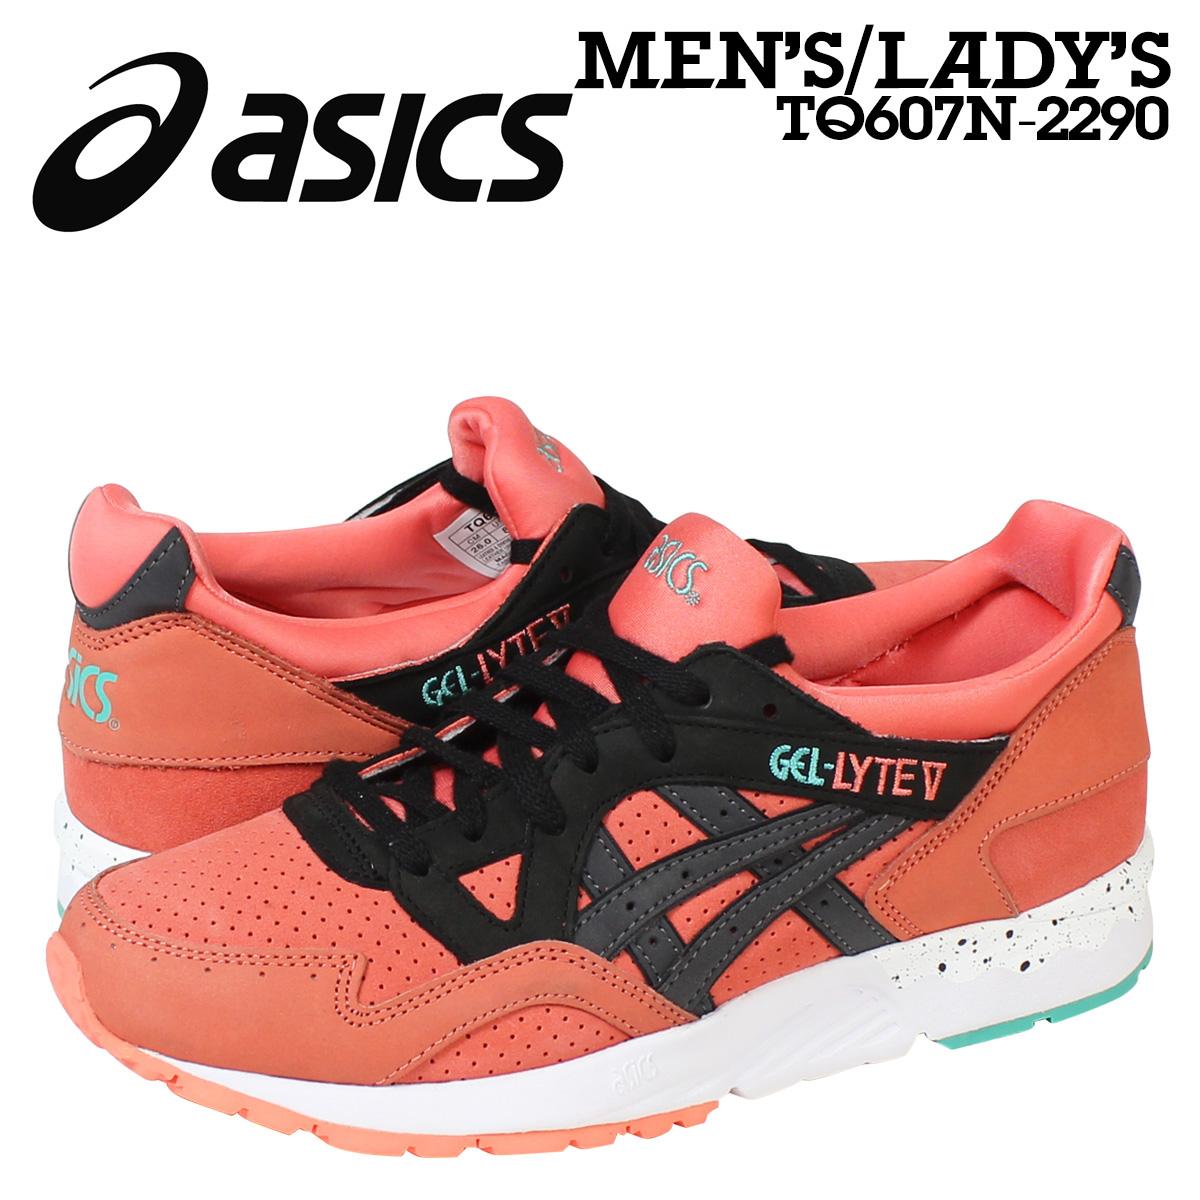 best sneakers 7d895 85317 asics Tiger ASICS tiger gel light 5 sneakers GEL-LYTE V TQ607N-2290 men gap  Dis shoes orange